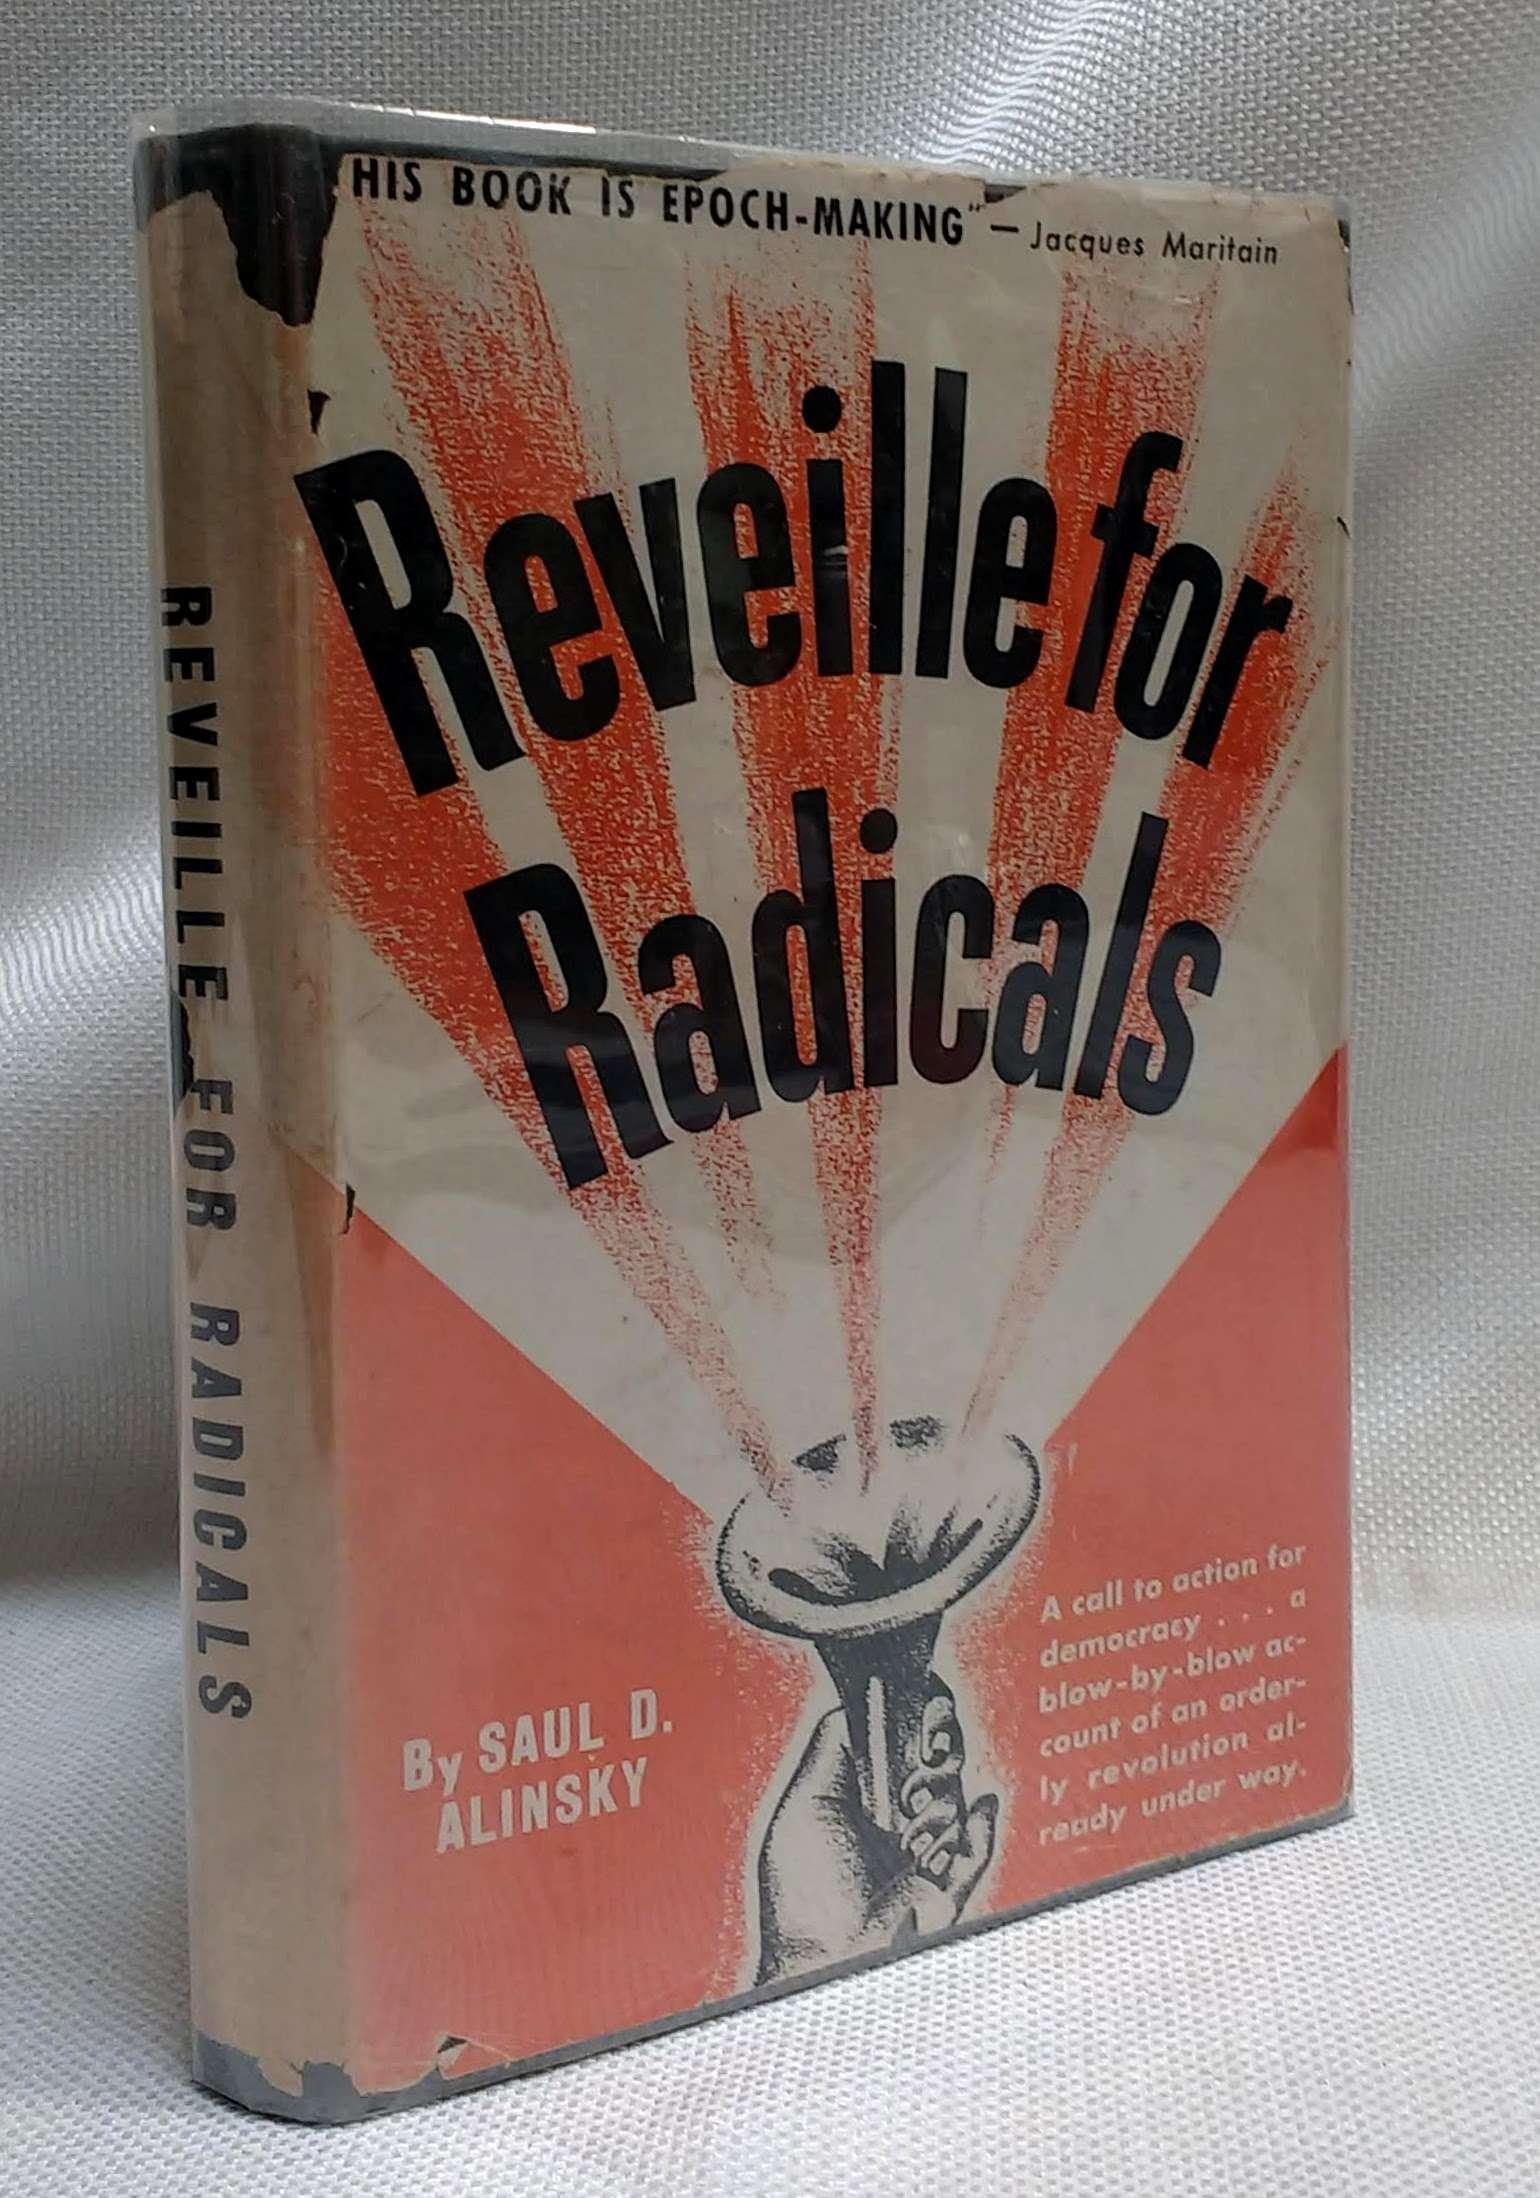 Reveille for Radicals, Alinsky, Saul D.